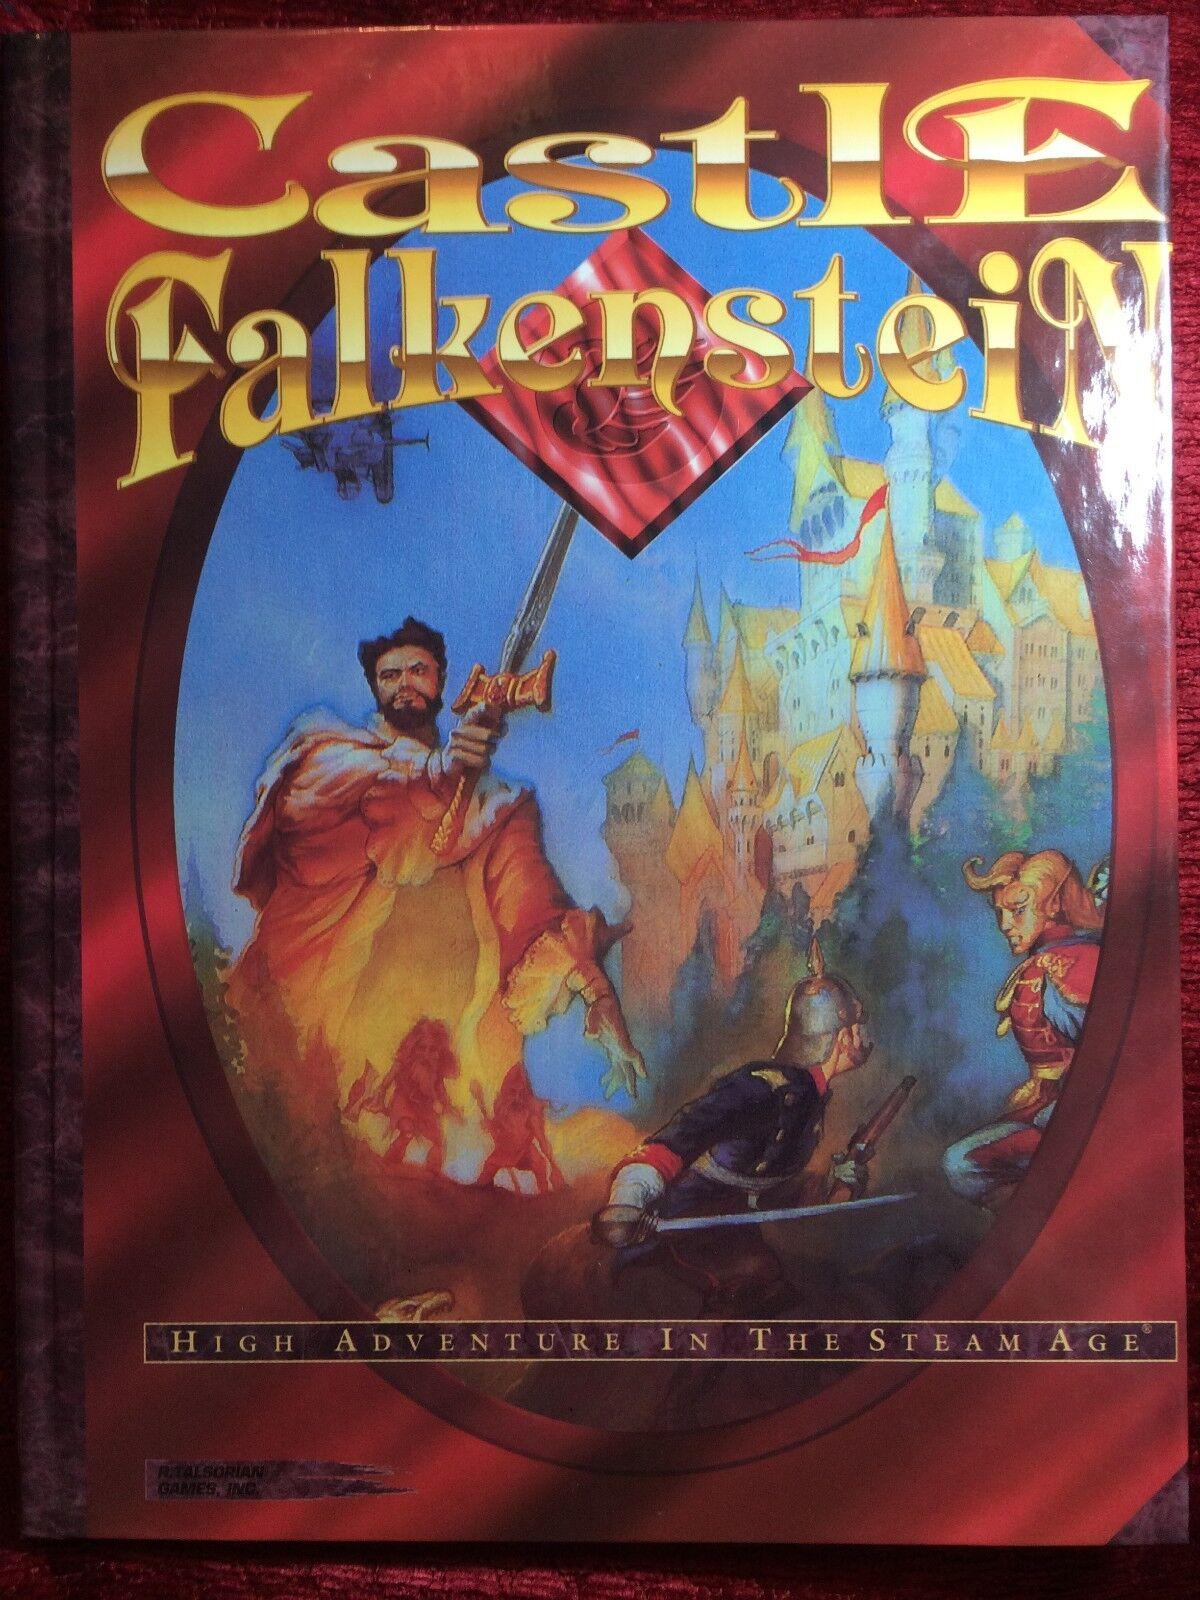 Castle Falkenstein - R. Talsorian Games - Hardcover - NEW